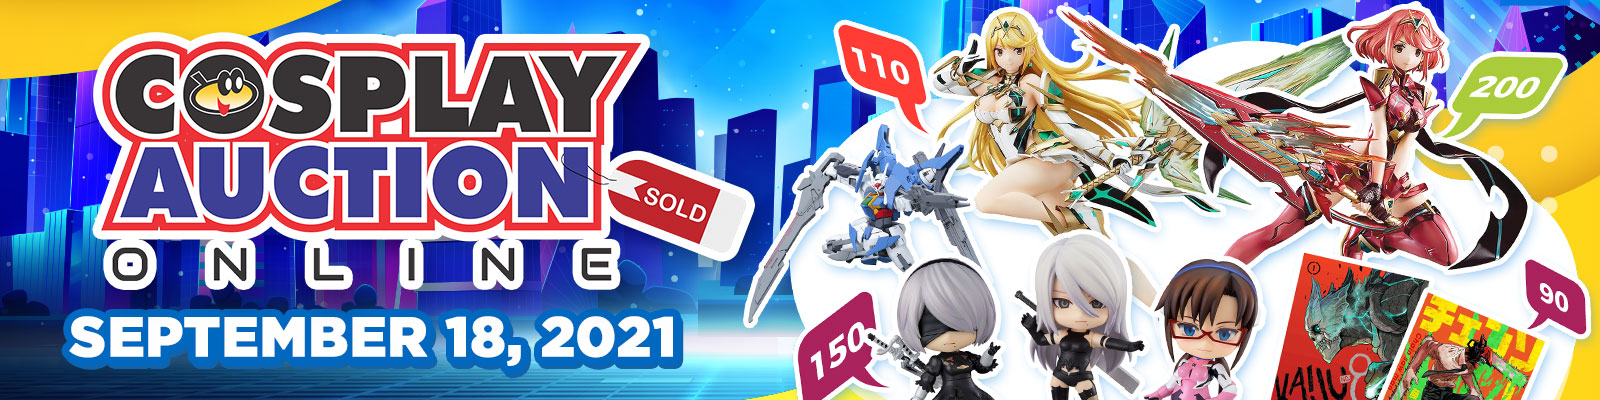 Cosplay Auction Online Vol. 8: Techtember